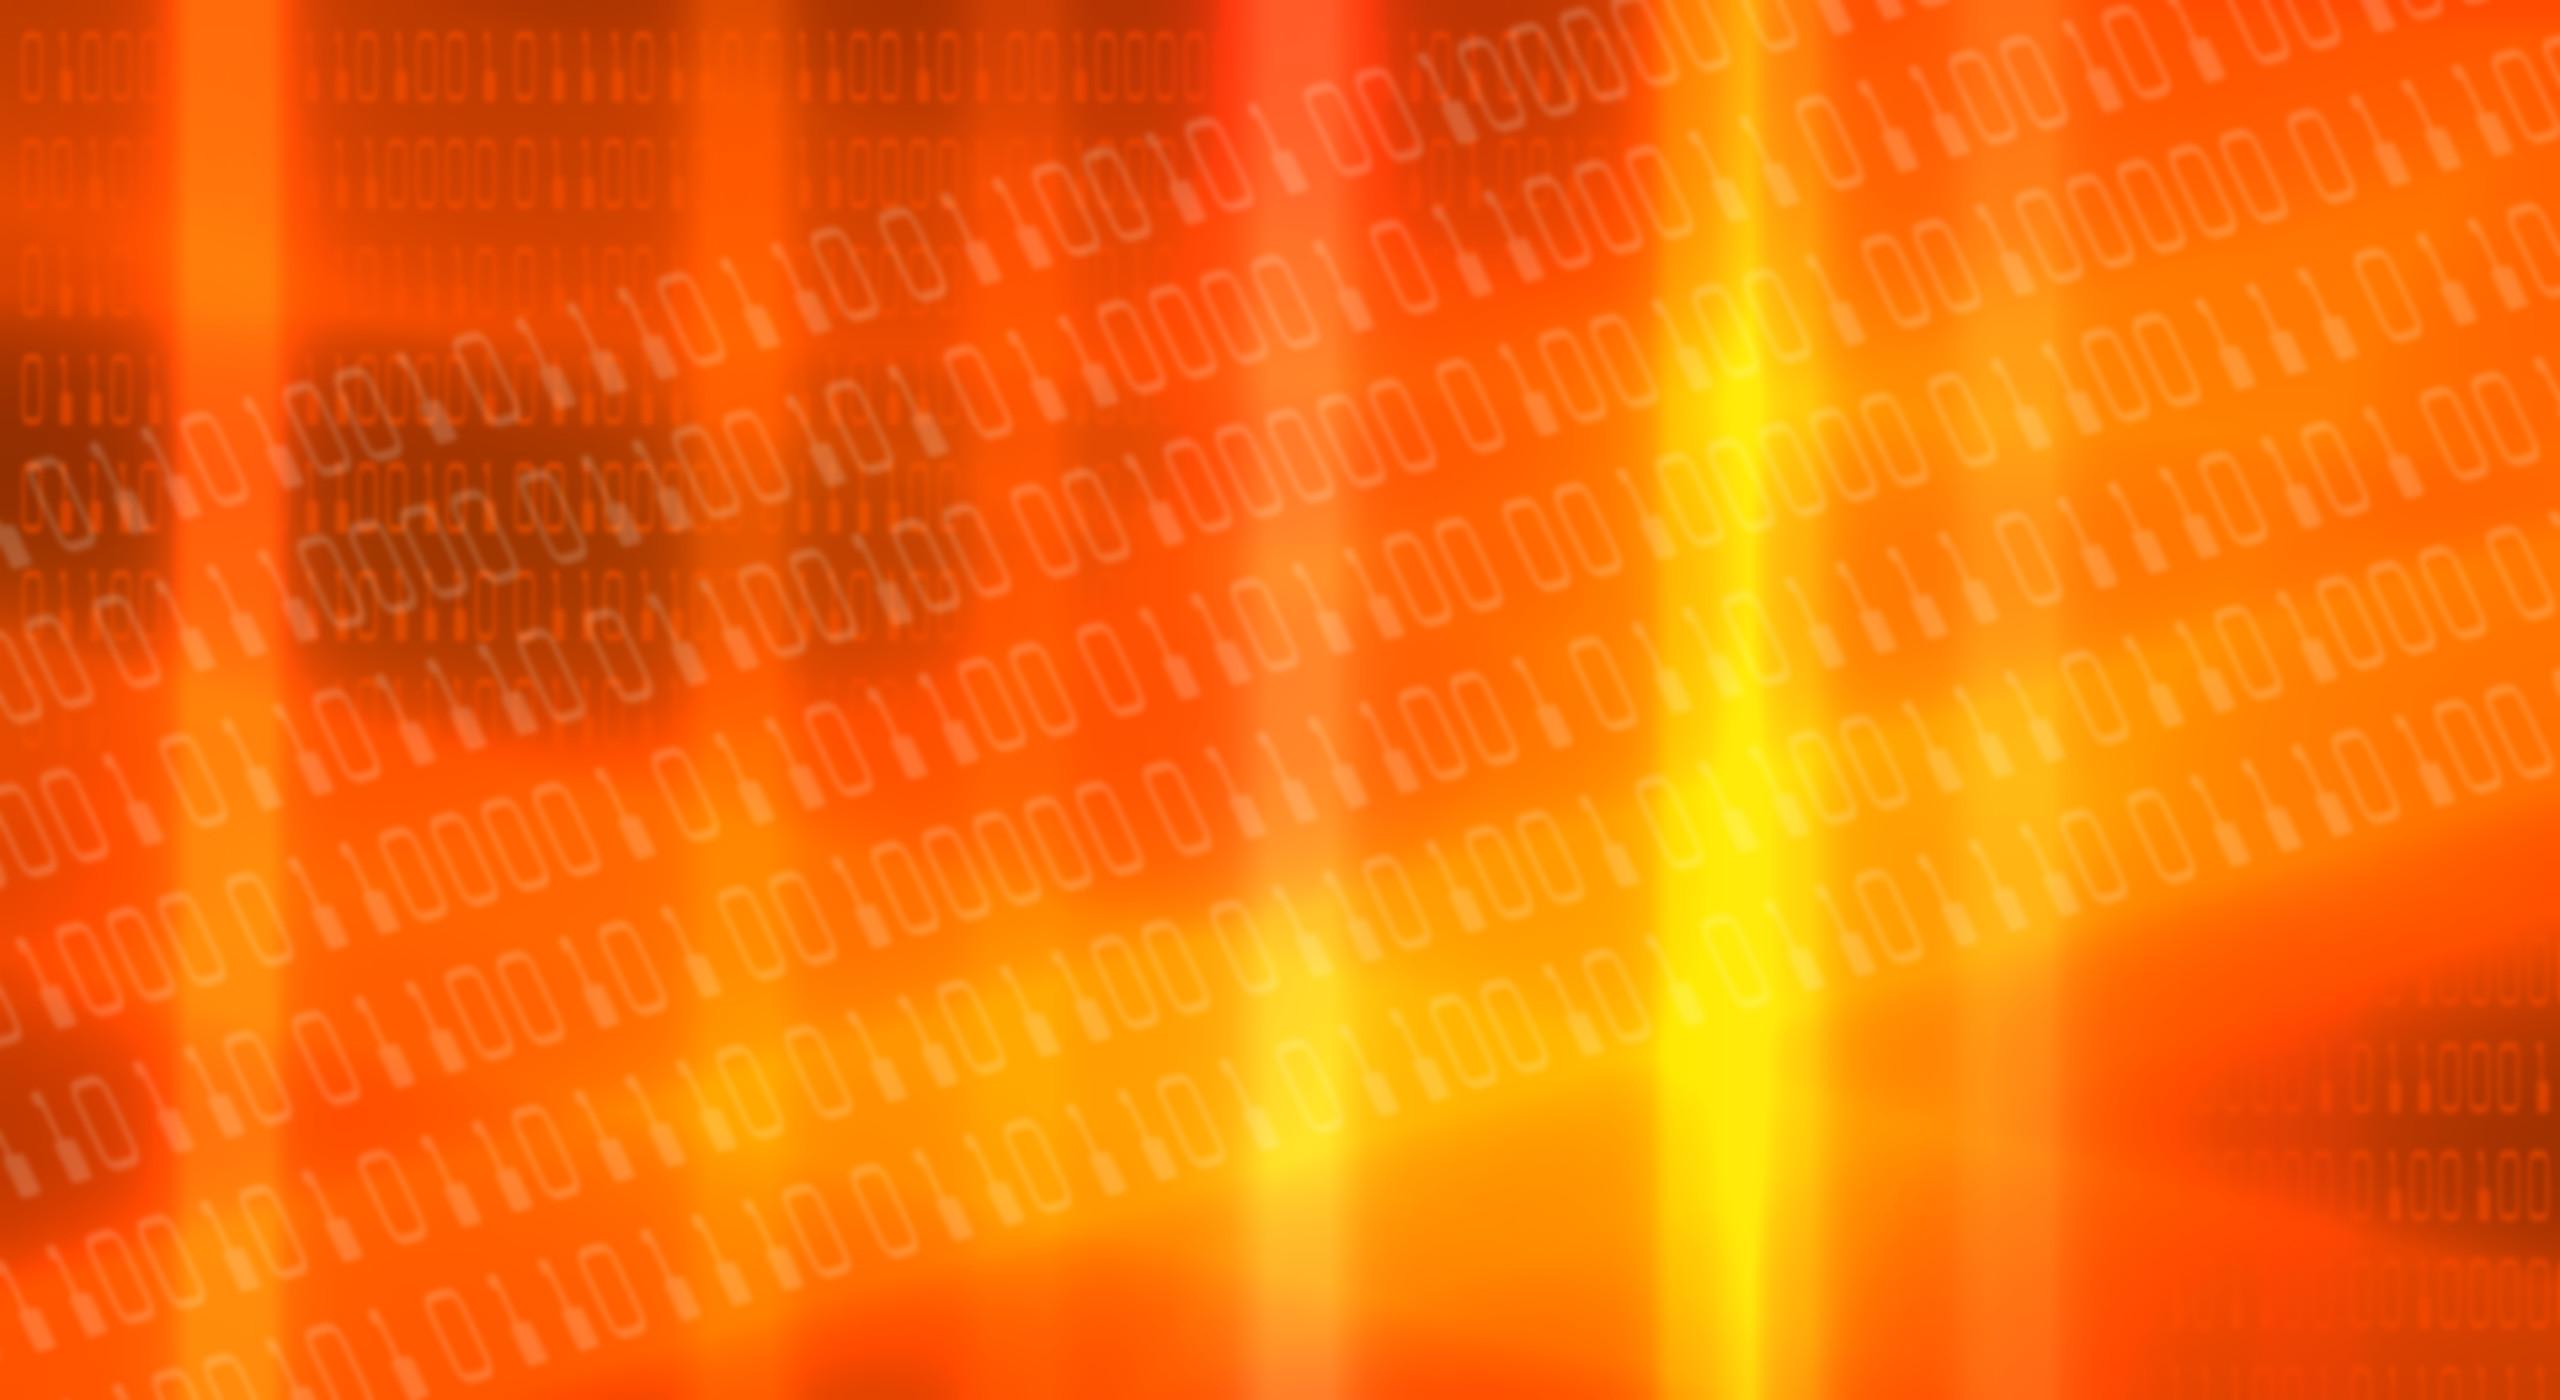 1920x1080 Arch Linux Binary Wallpaper by SpiritSTR Arch Linux Binary Wallpaper by SpiritSTR